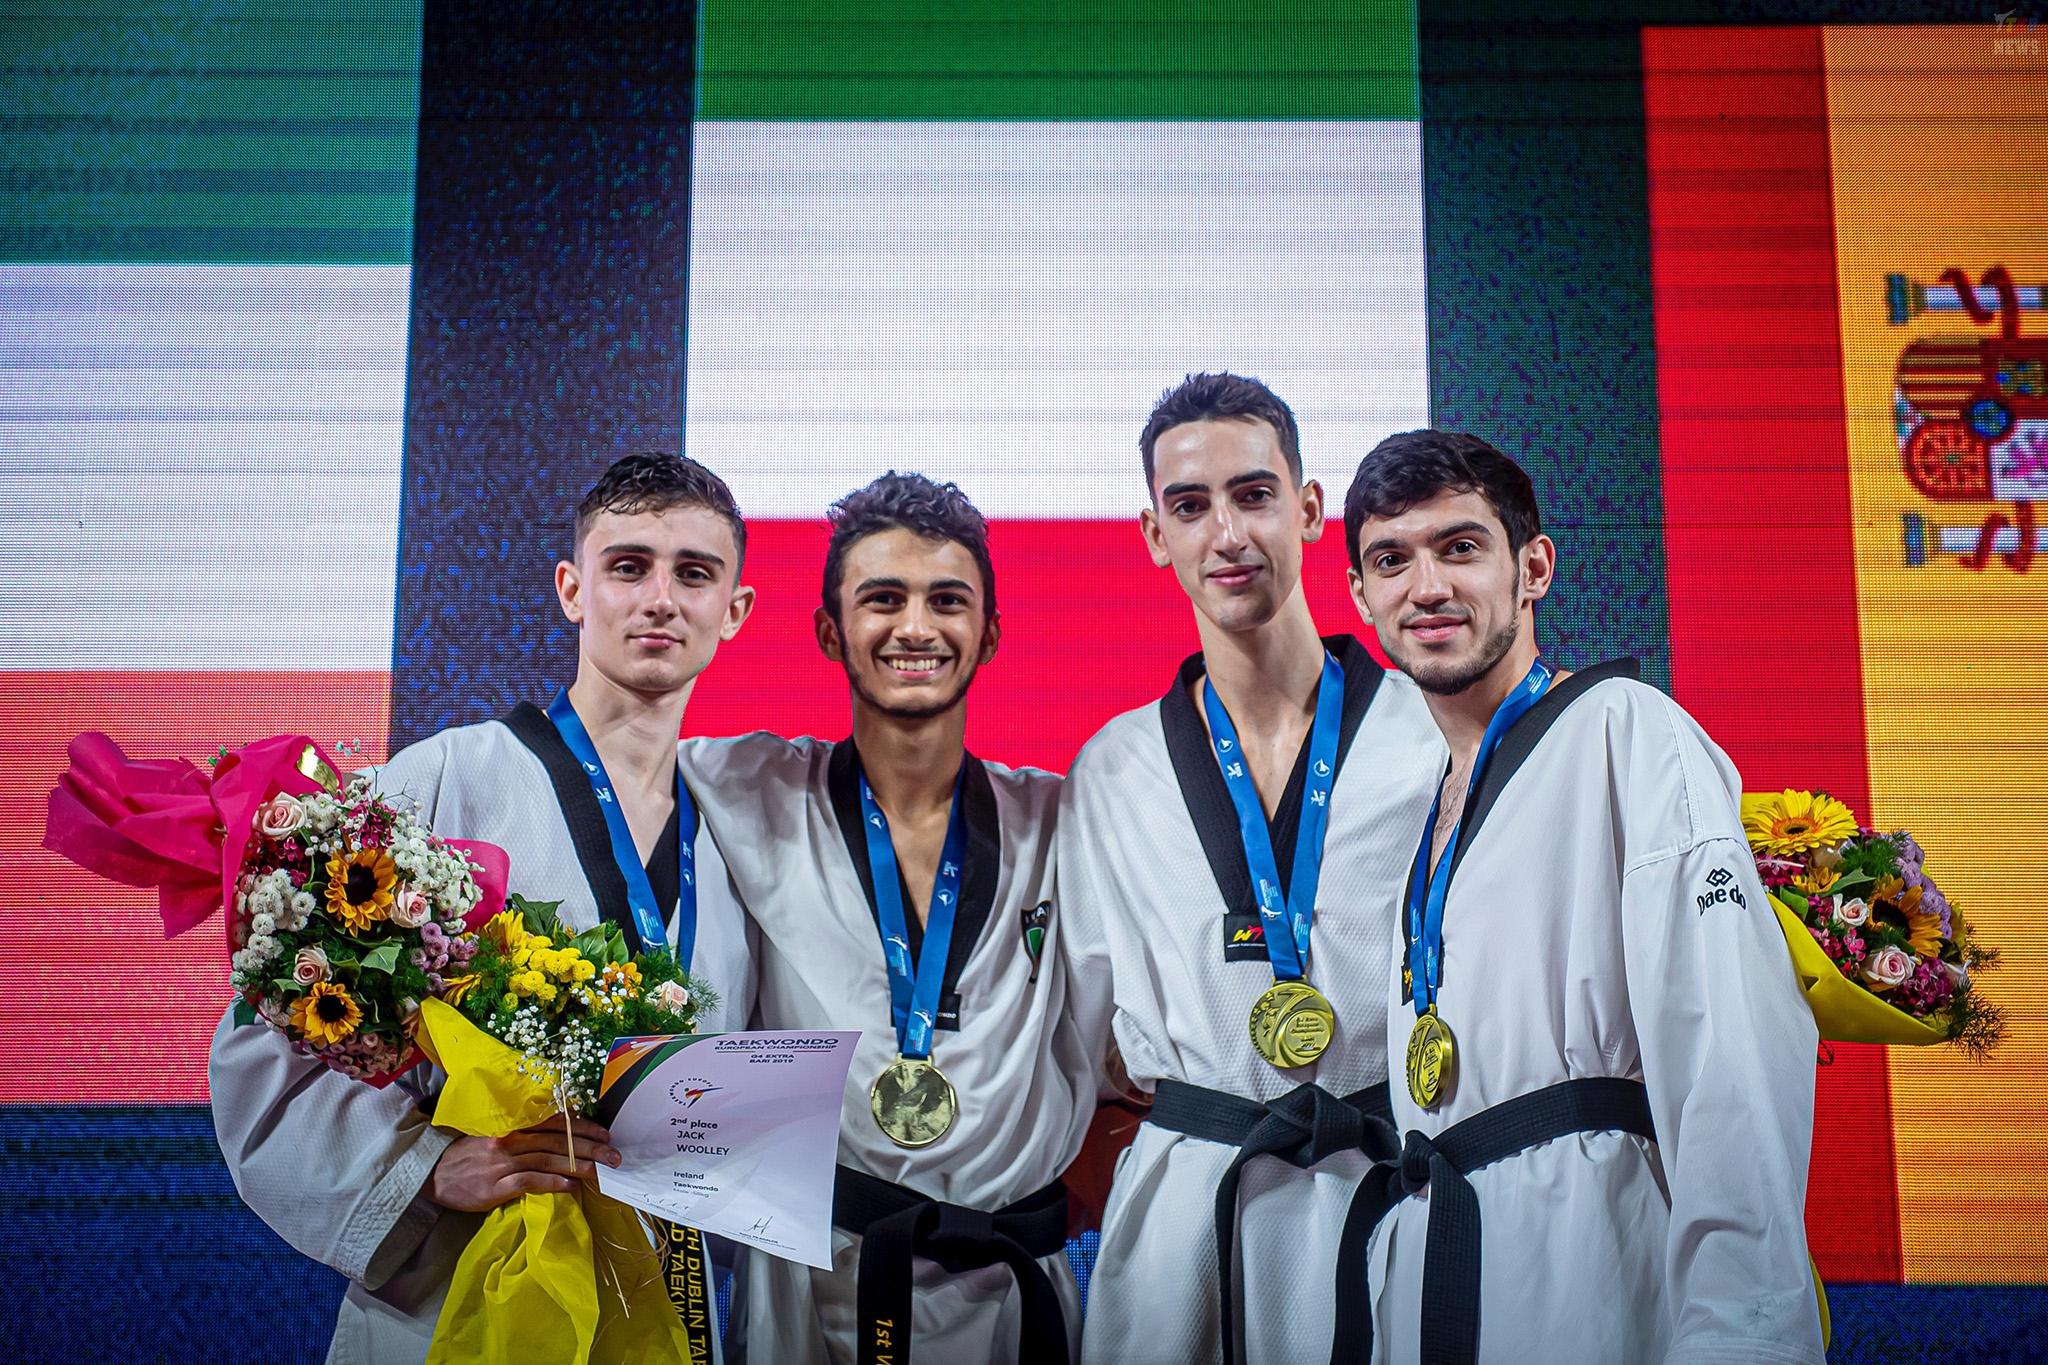 1572789955_male-58a_g4-extra-european-taekwondo-championships-bari-2019